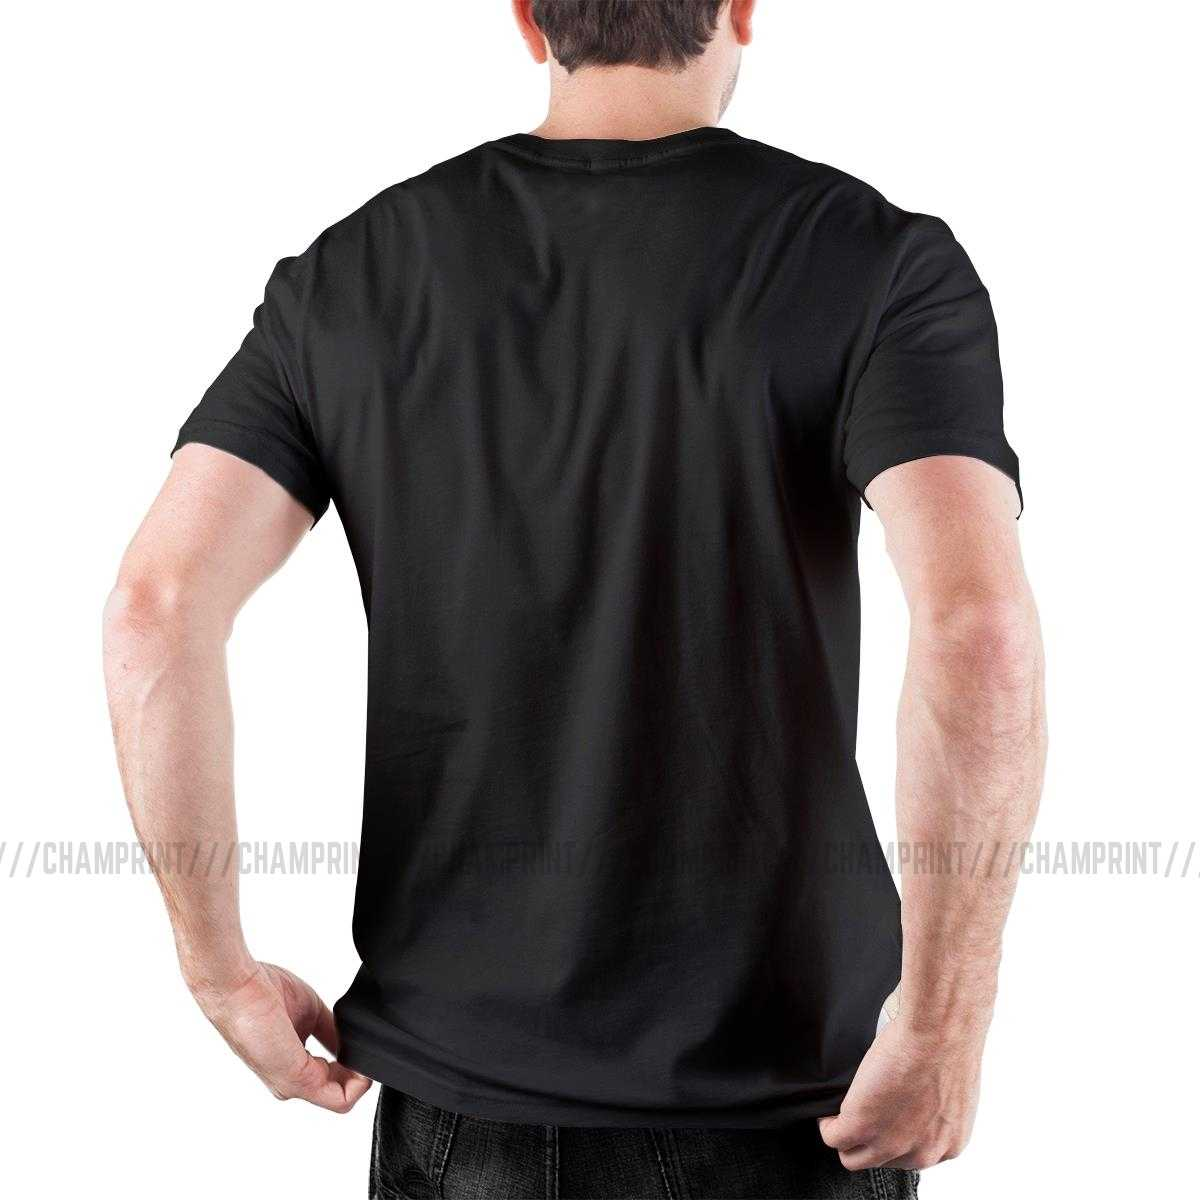 Data um anime ao vivo kurumi tokisaki camisa masculina t novidade tees manga curta crewneck t-shirts 100% algodão 6xl roupas